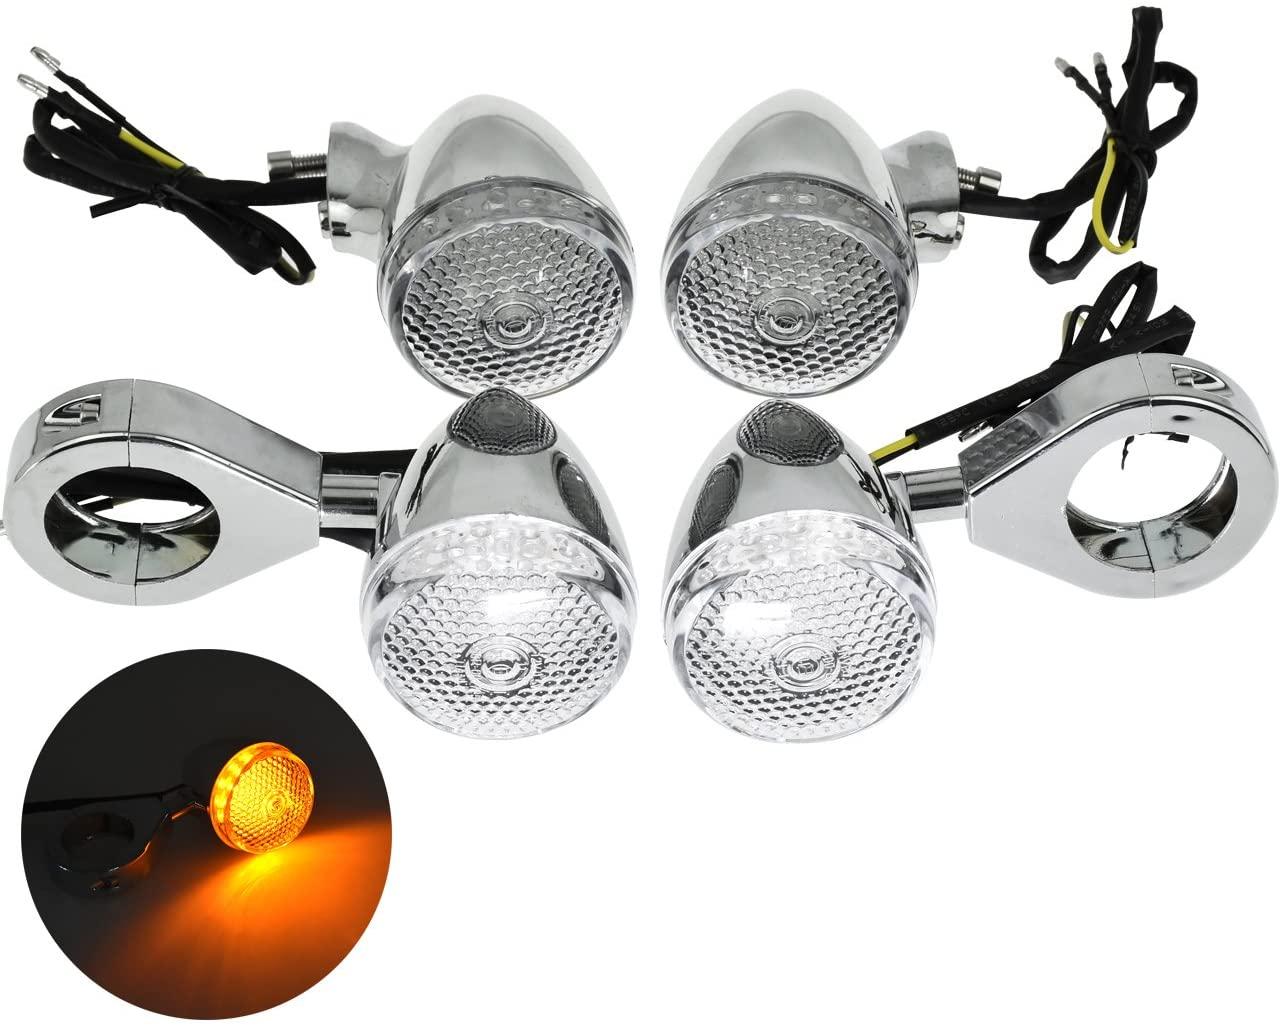 YHMTIVTU LED Motorcycle Turn Signals 39mm Fork Clamp Front Rear Blinker Indicator Light Universal Bullet Turn Signal Lights for Harley Honda Kawasaki Suzuki Yamaha,White Lens Amber Lamp,Chrome